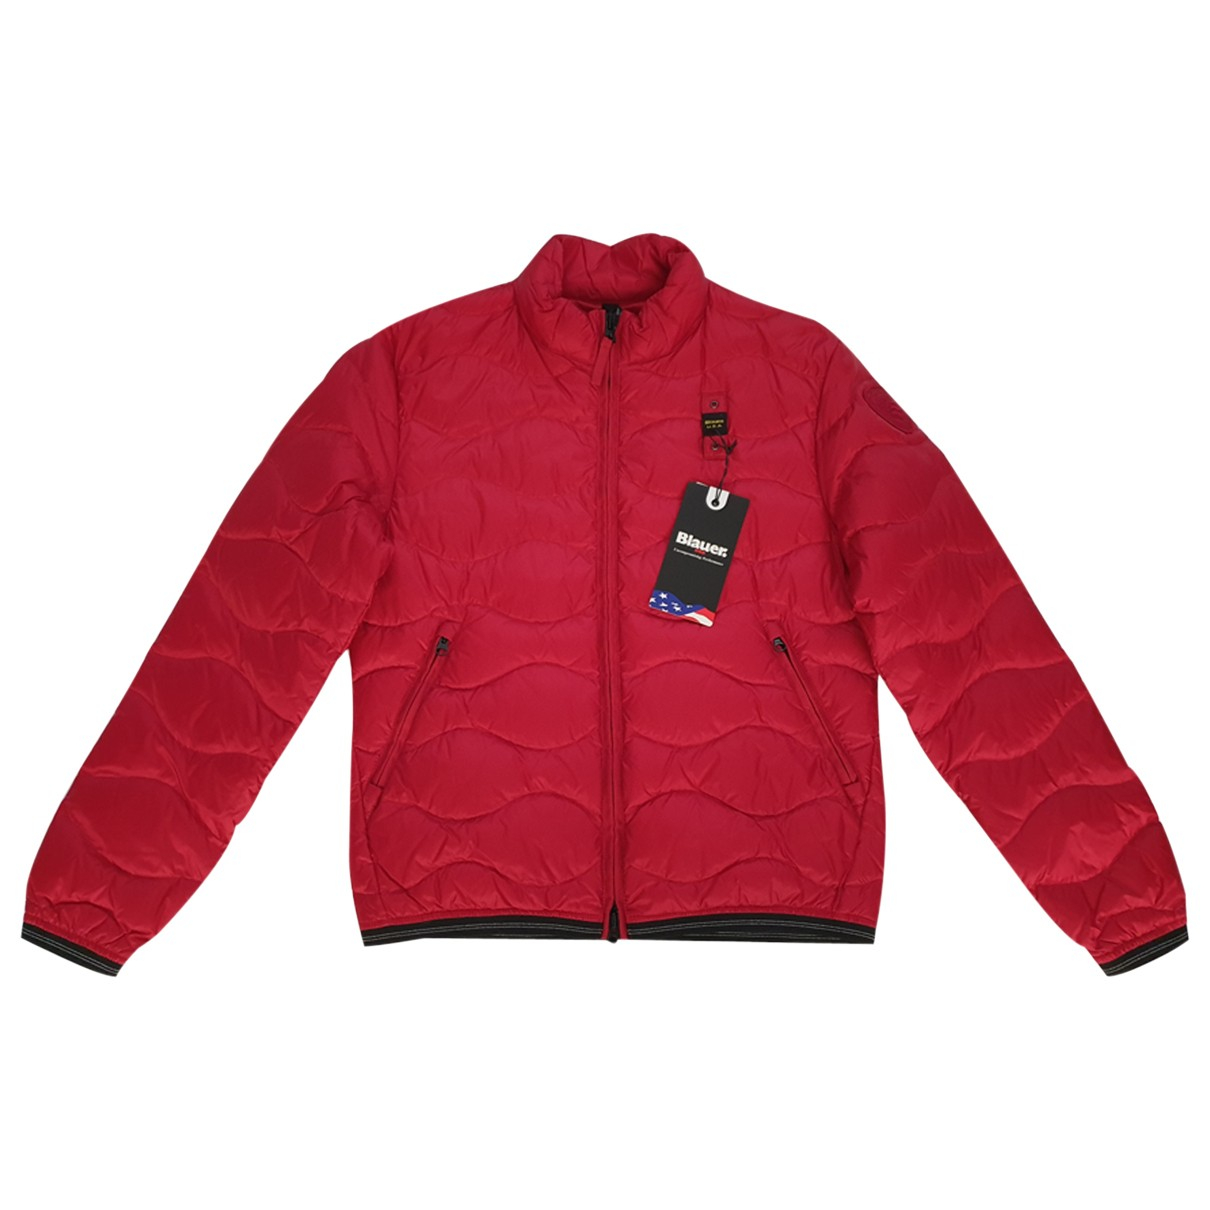 Blauer N Red jacket  for Men XL International